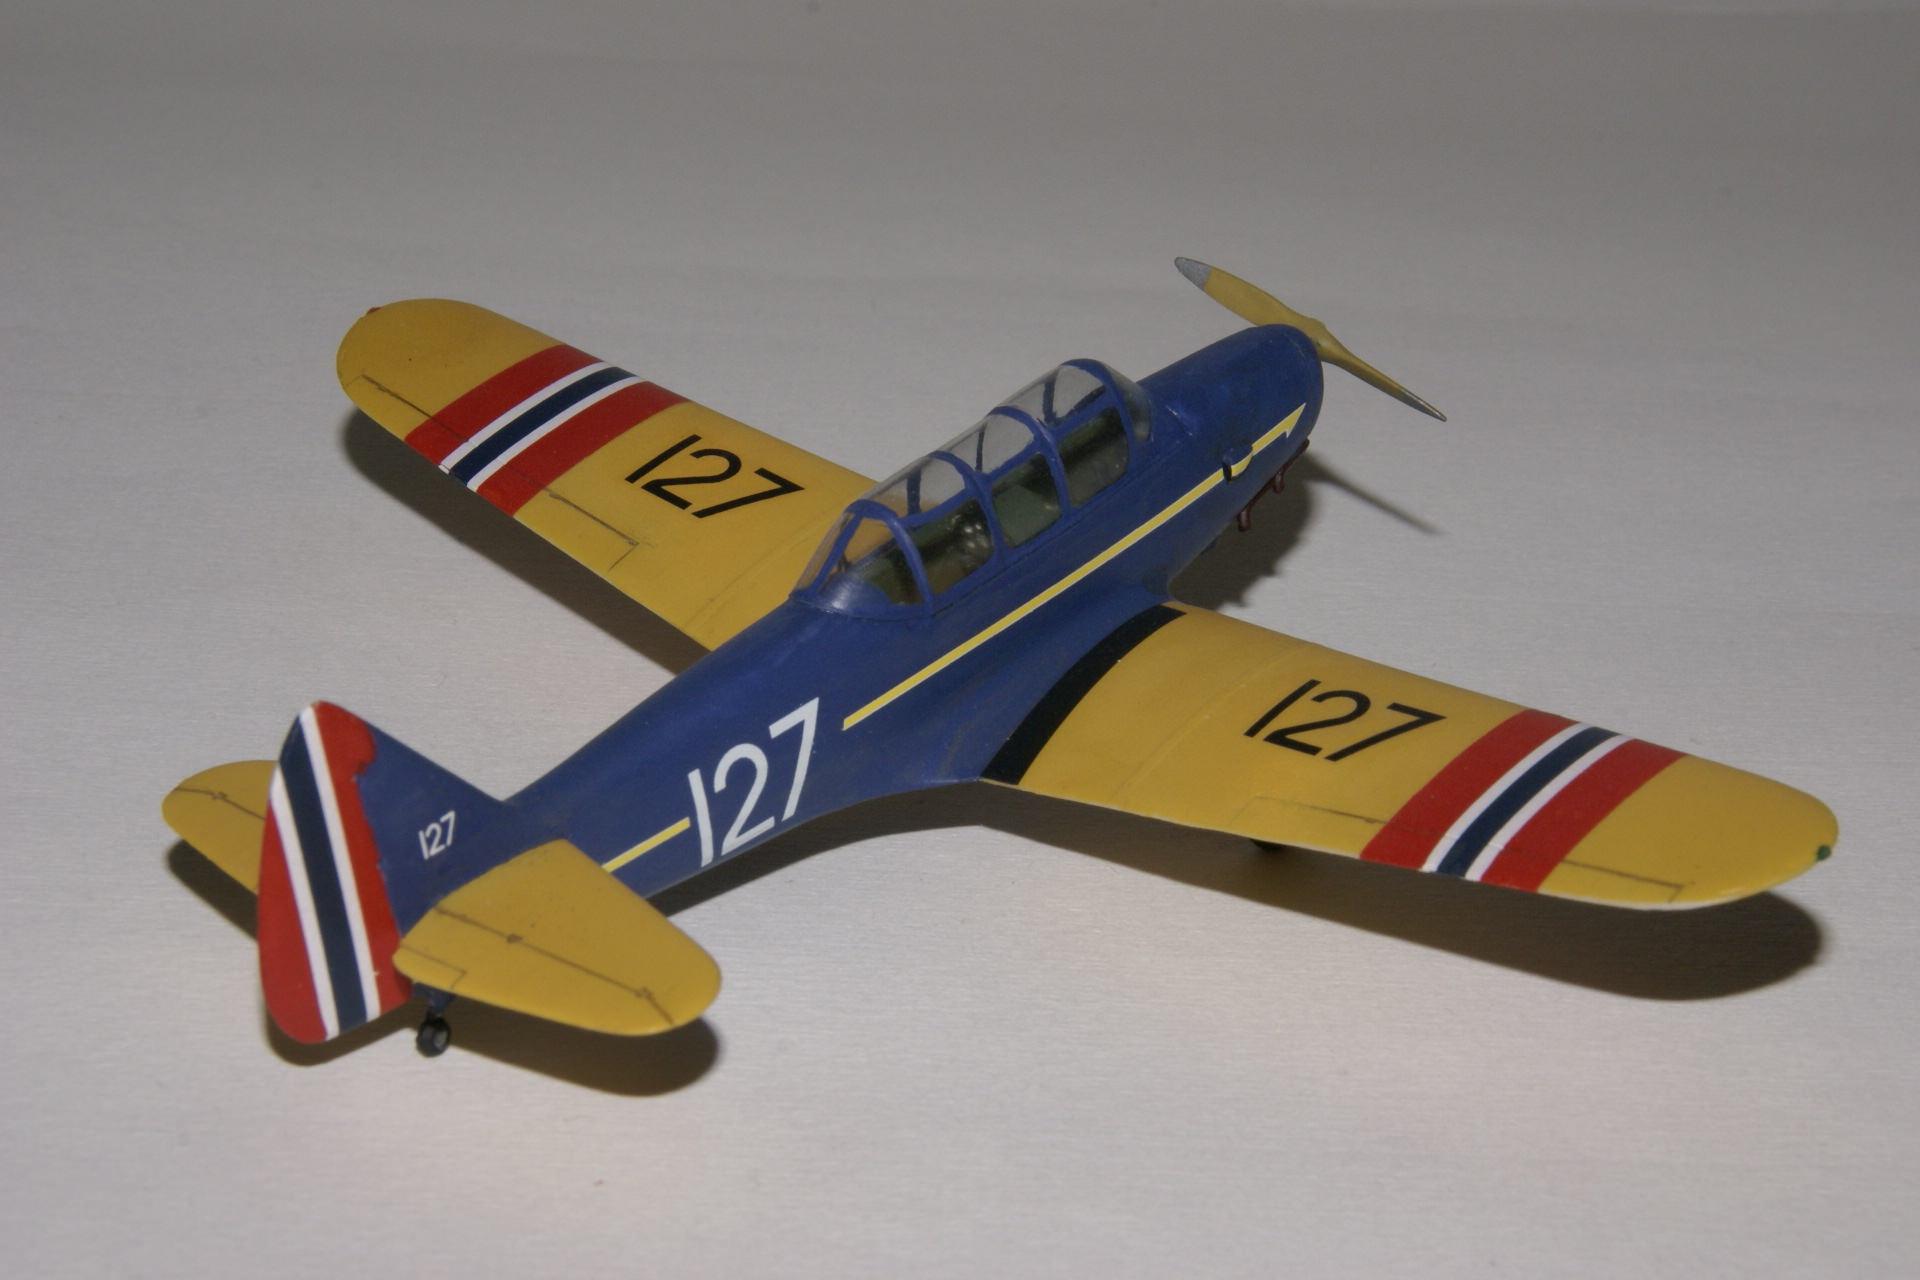 Fairchild pt 26 cornell i 3